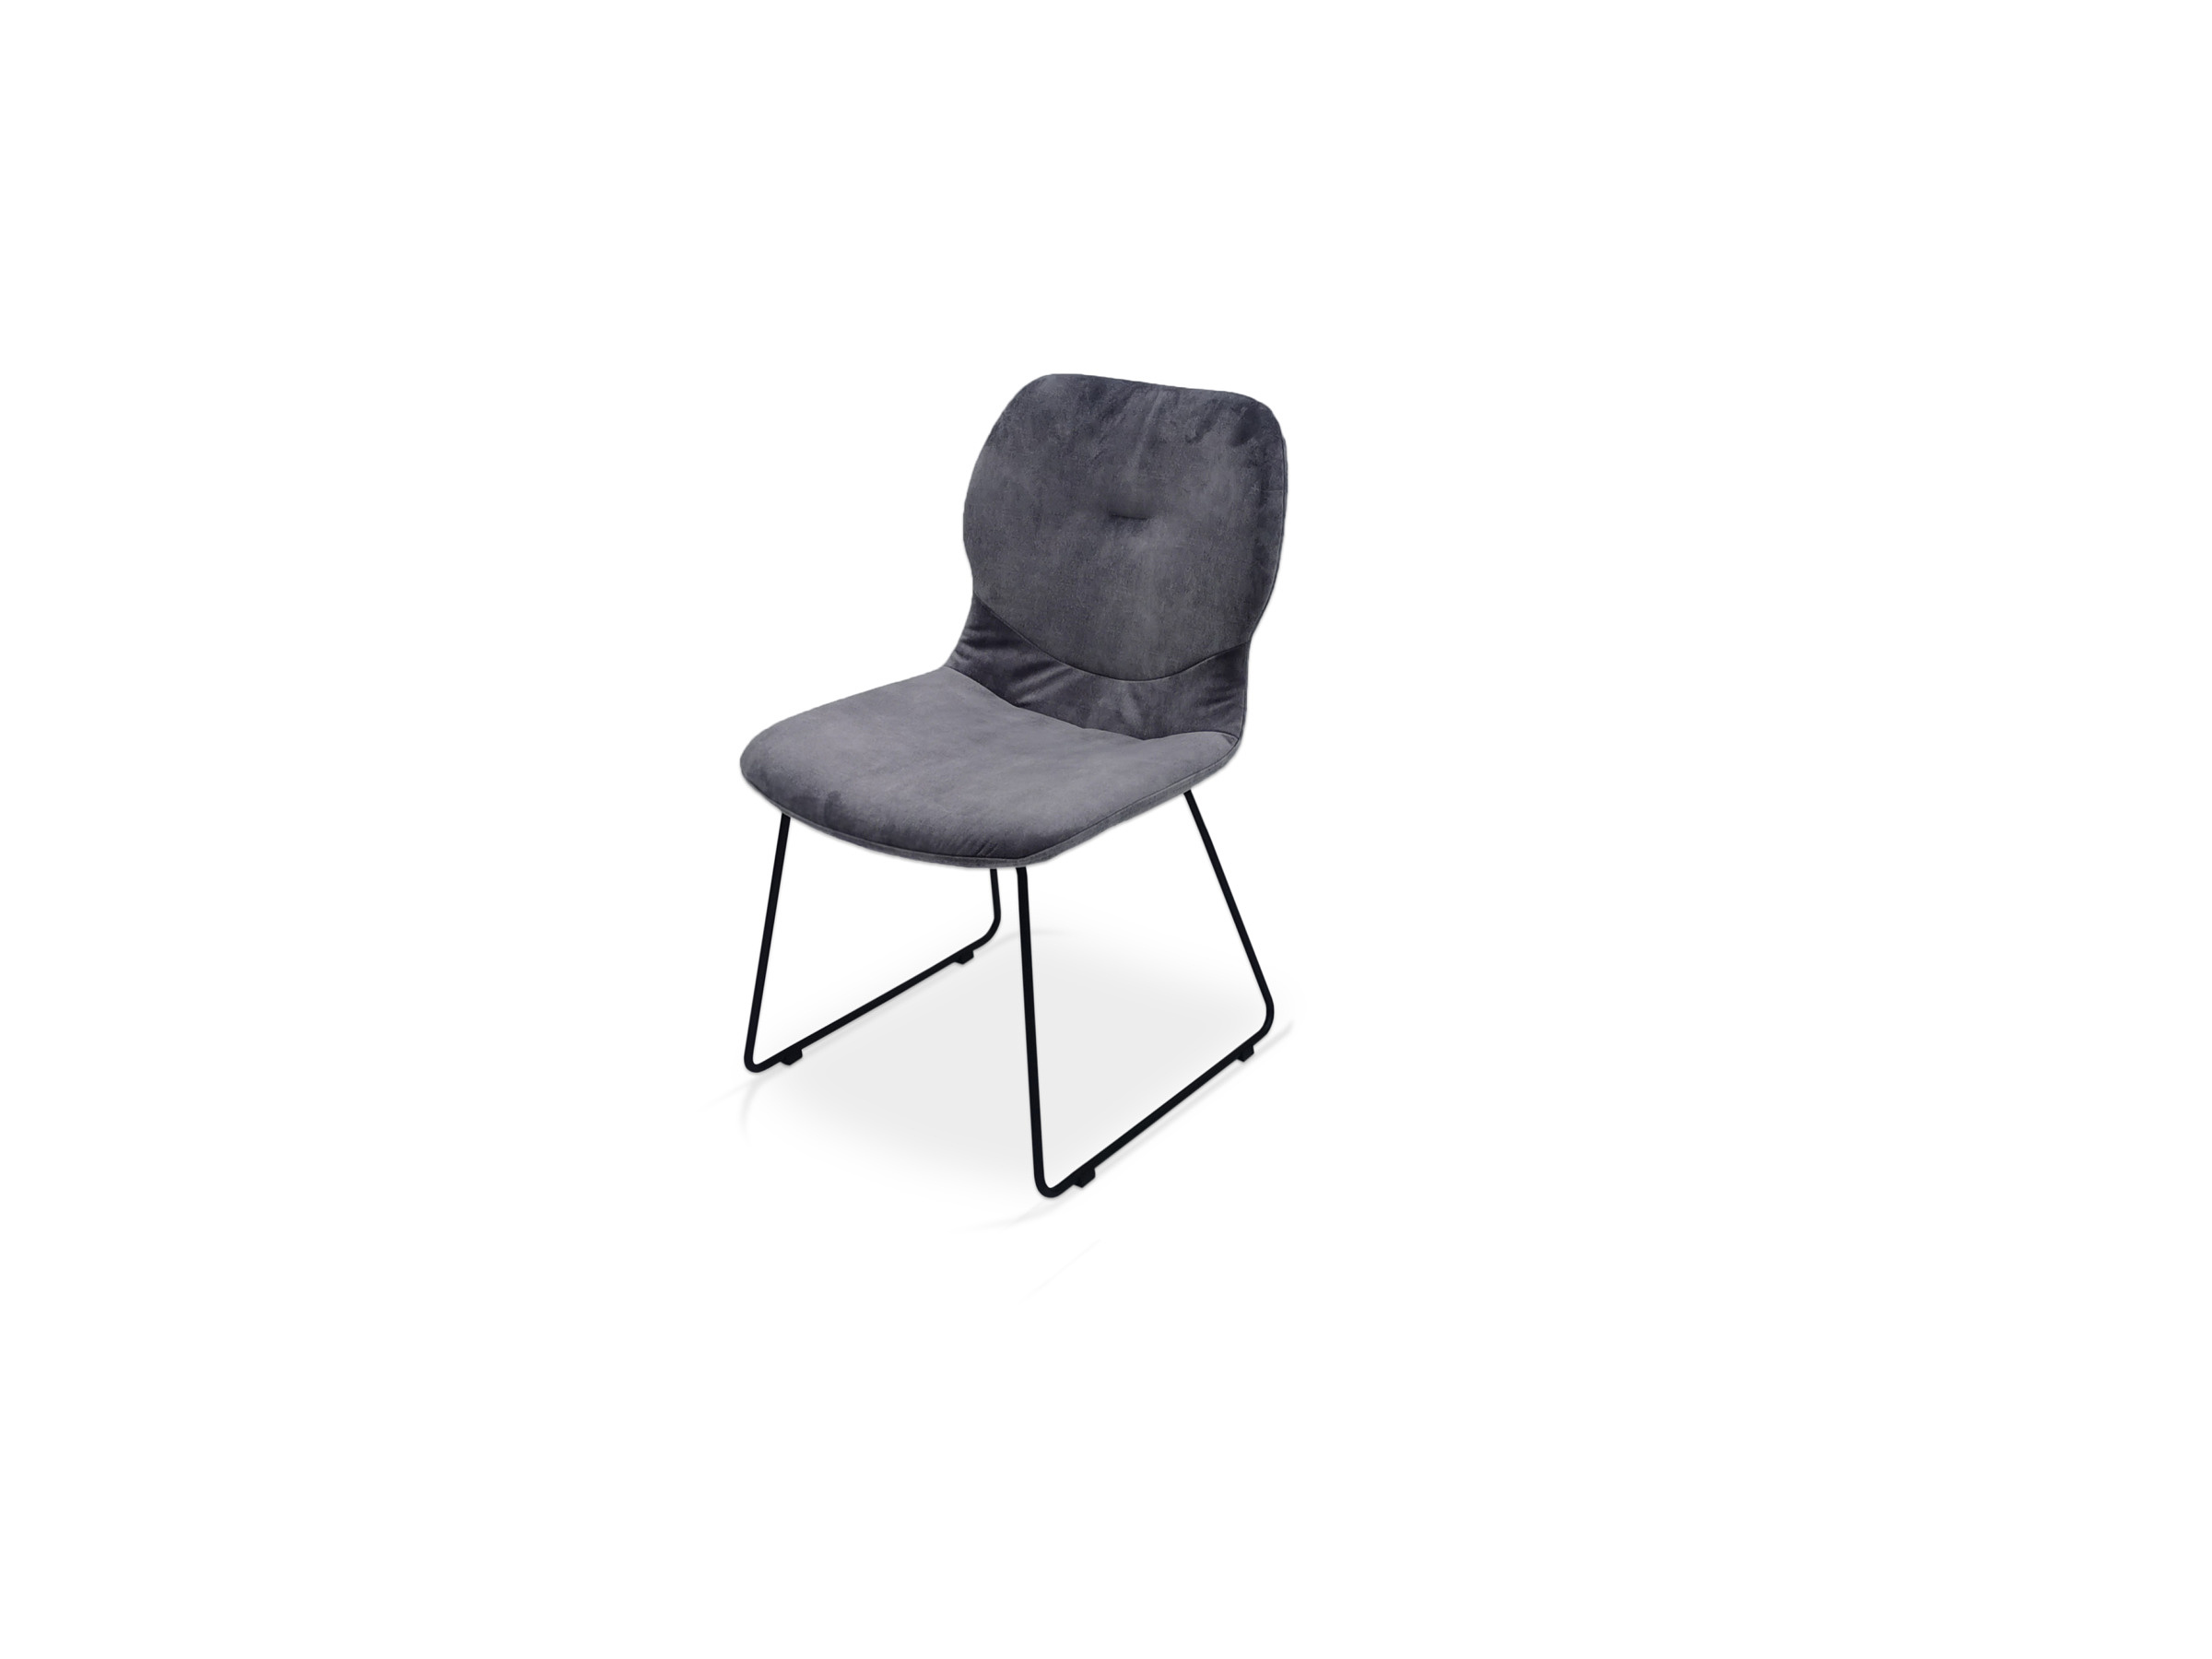 Szre krzesełko na czarnej nóżce płoza